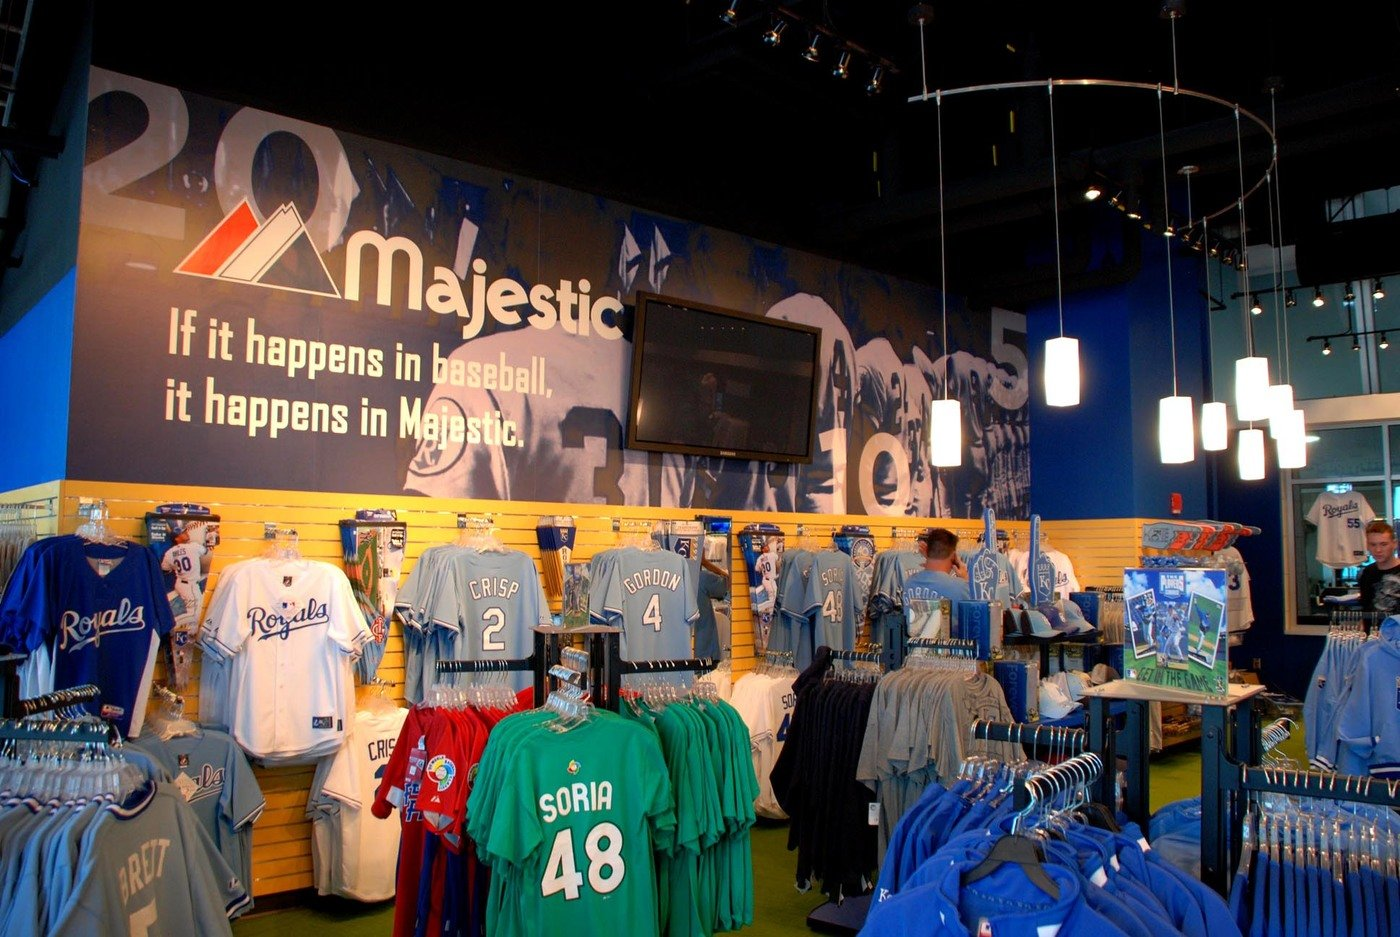 brand new cdad1 71db6 Kansas City Royals - Kauffman Stadium by Spencer Branham at ...